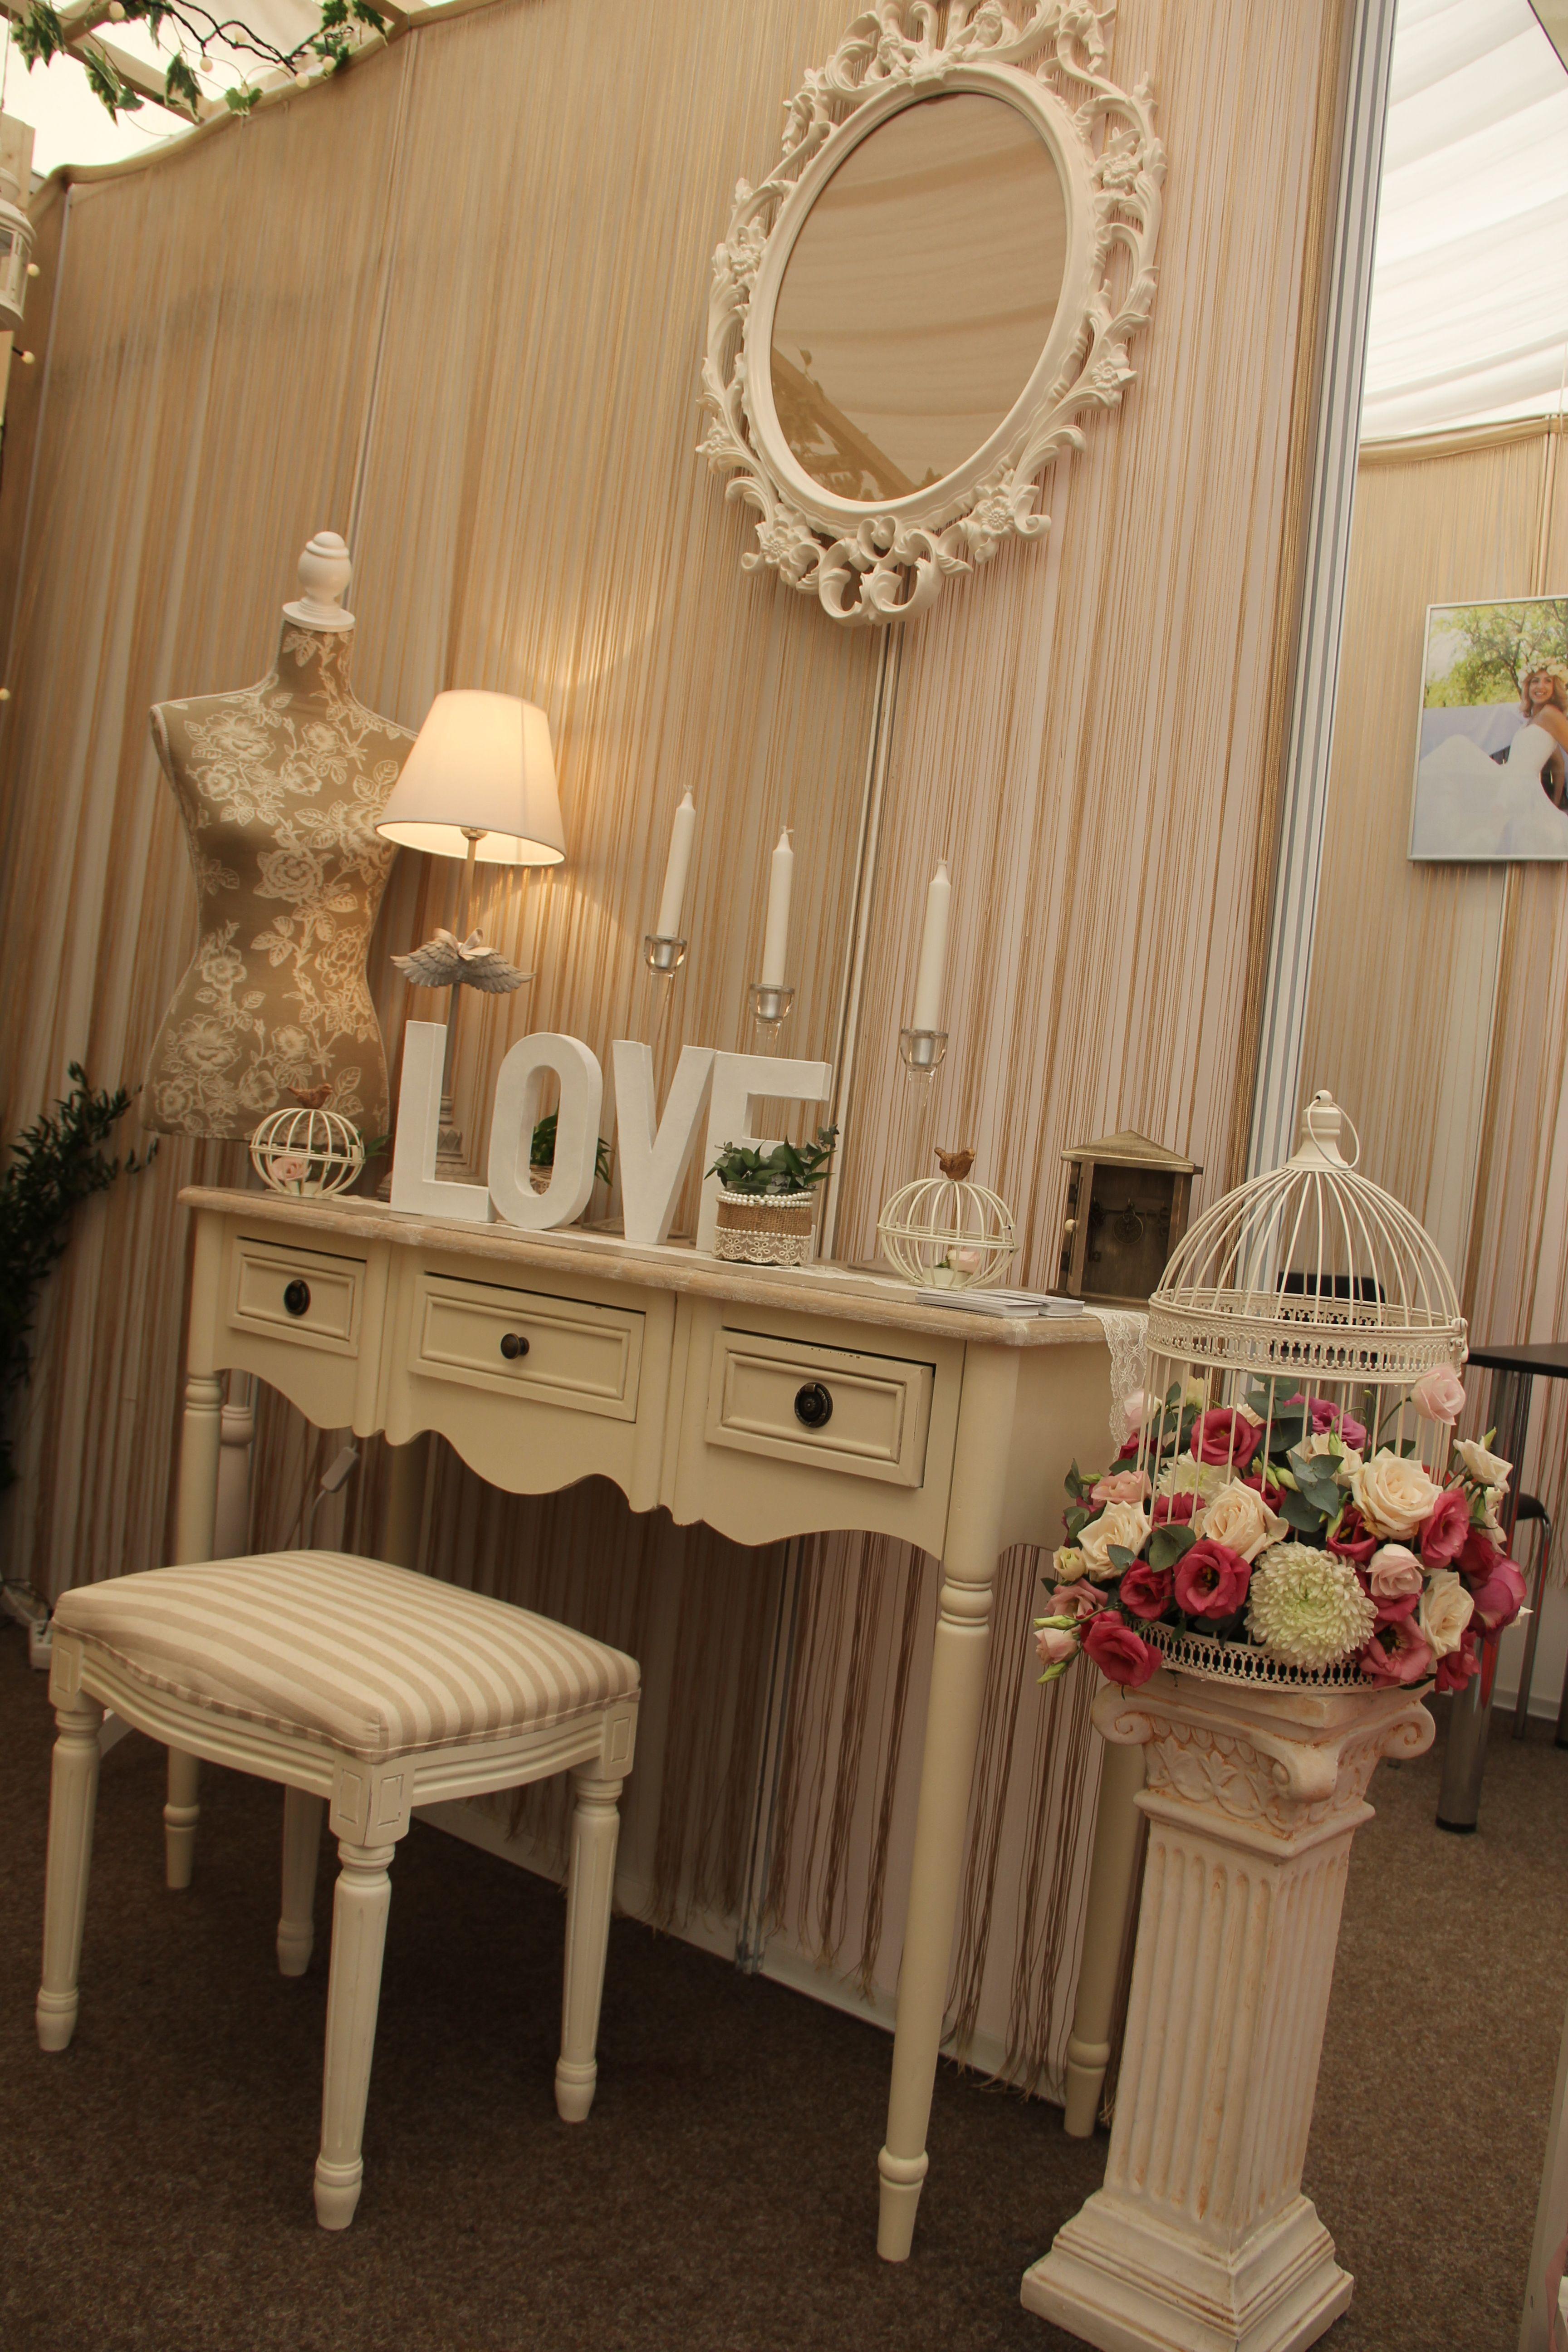 Lovely Bride Corner With Vintage & Romantic Decorations (Decor Pentru